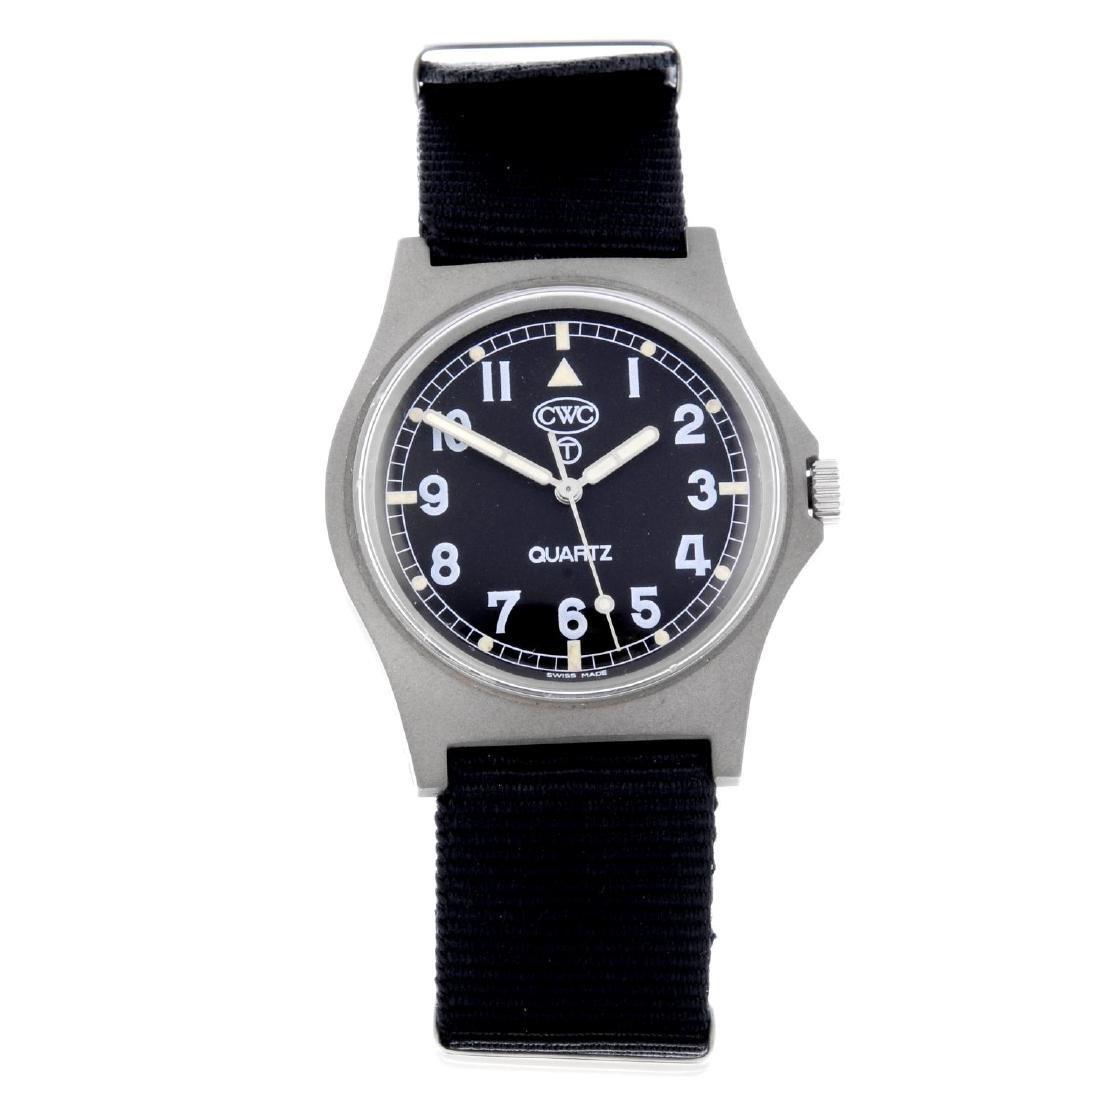 CWC - a gentleman's military issue wrist watch.